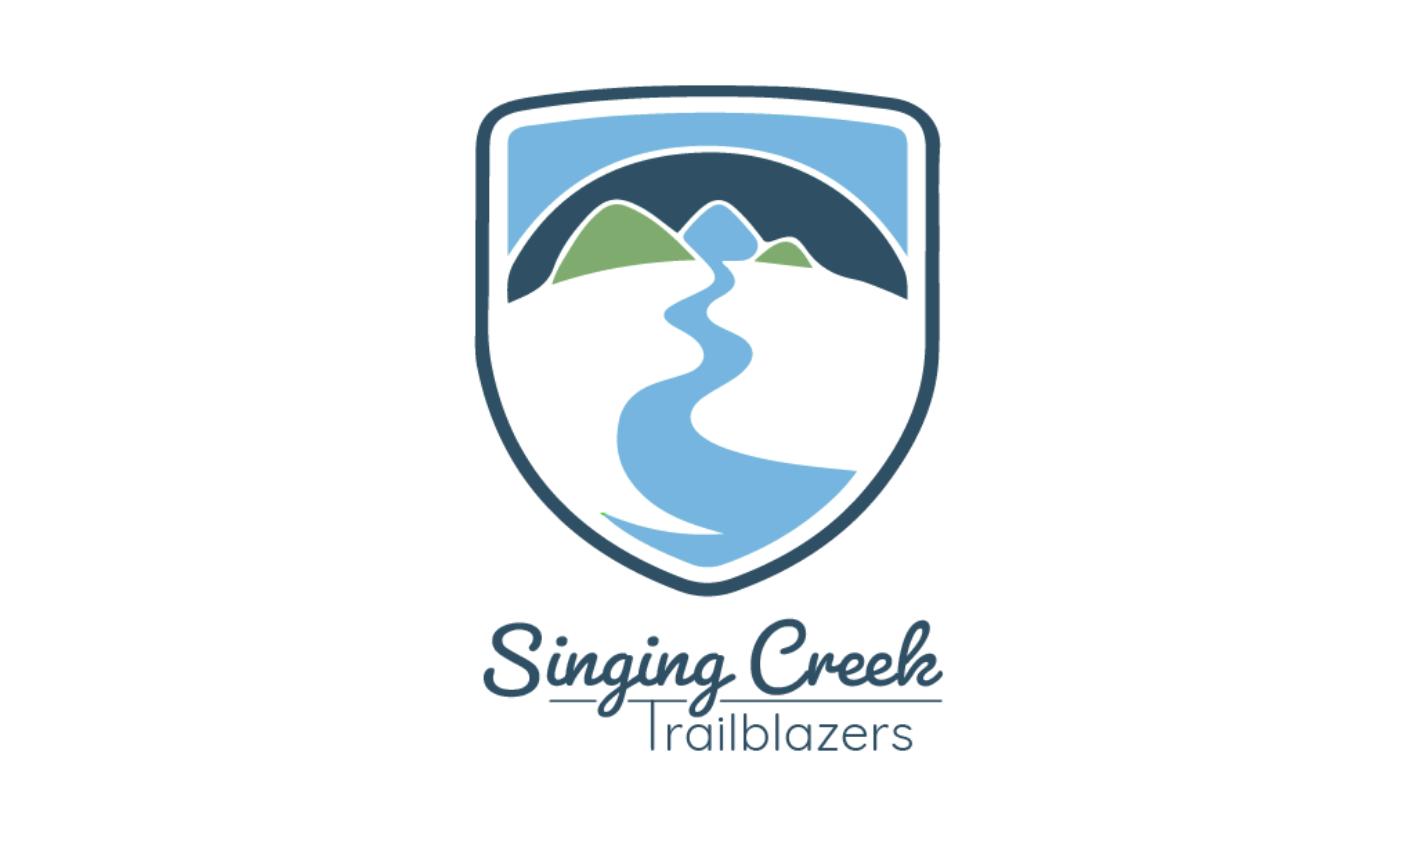 Singing Creek Trailblazers